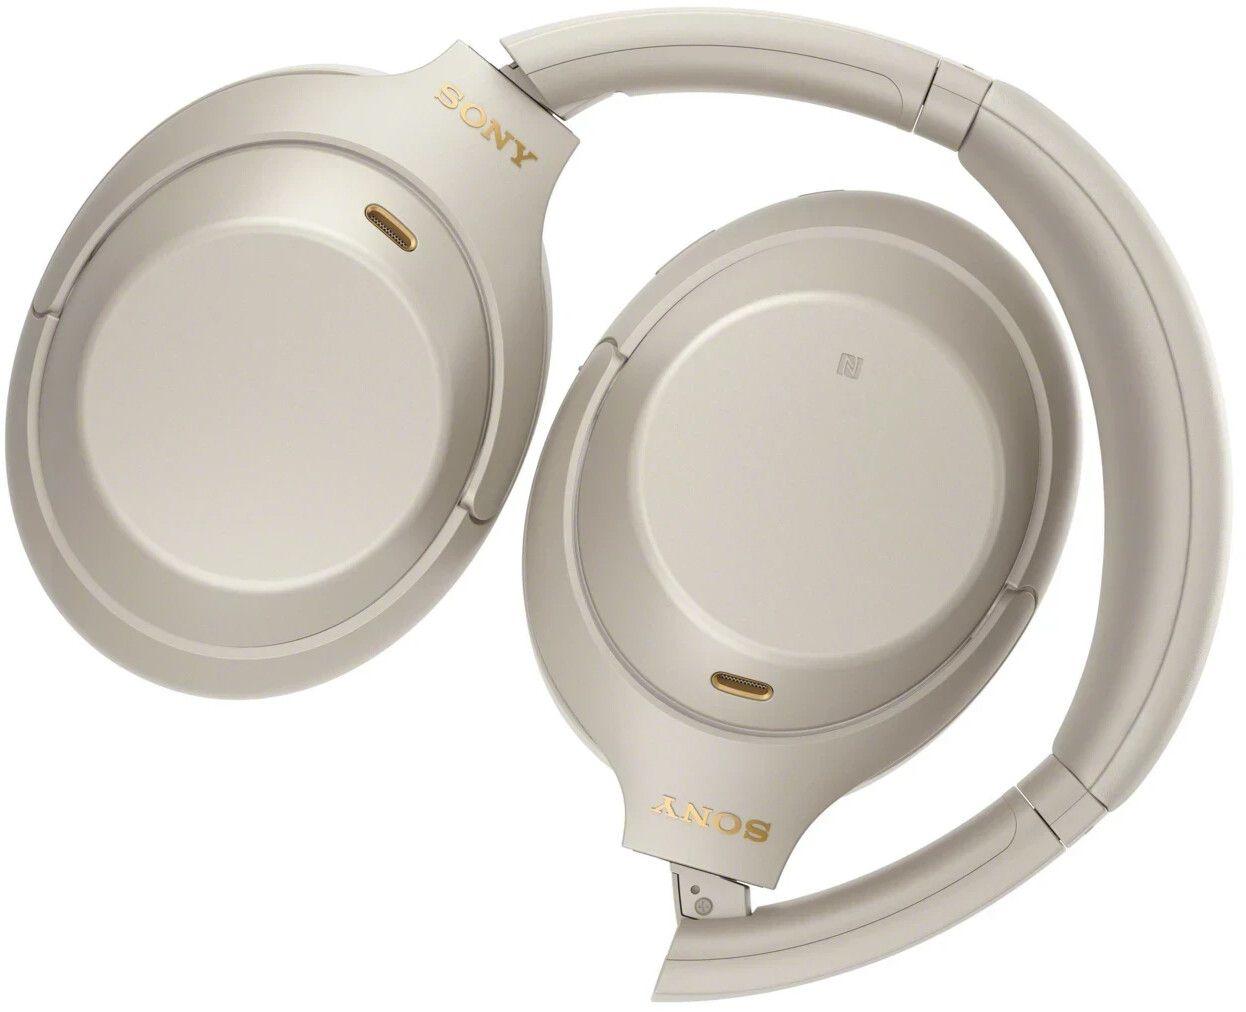 Sony WH 1000XM4 Over Ear Kopfhörer mit Noise Cancelling für 274,9€ (statt 305€)